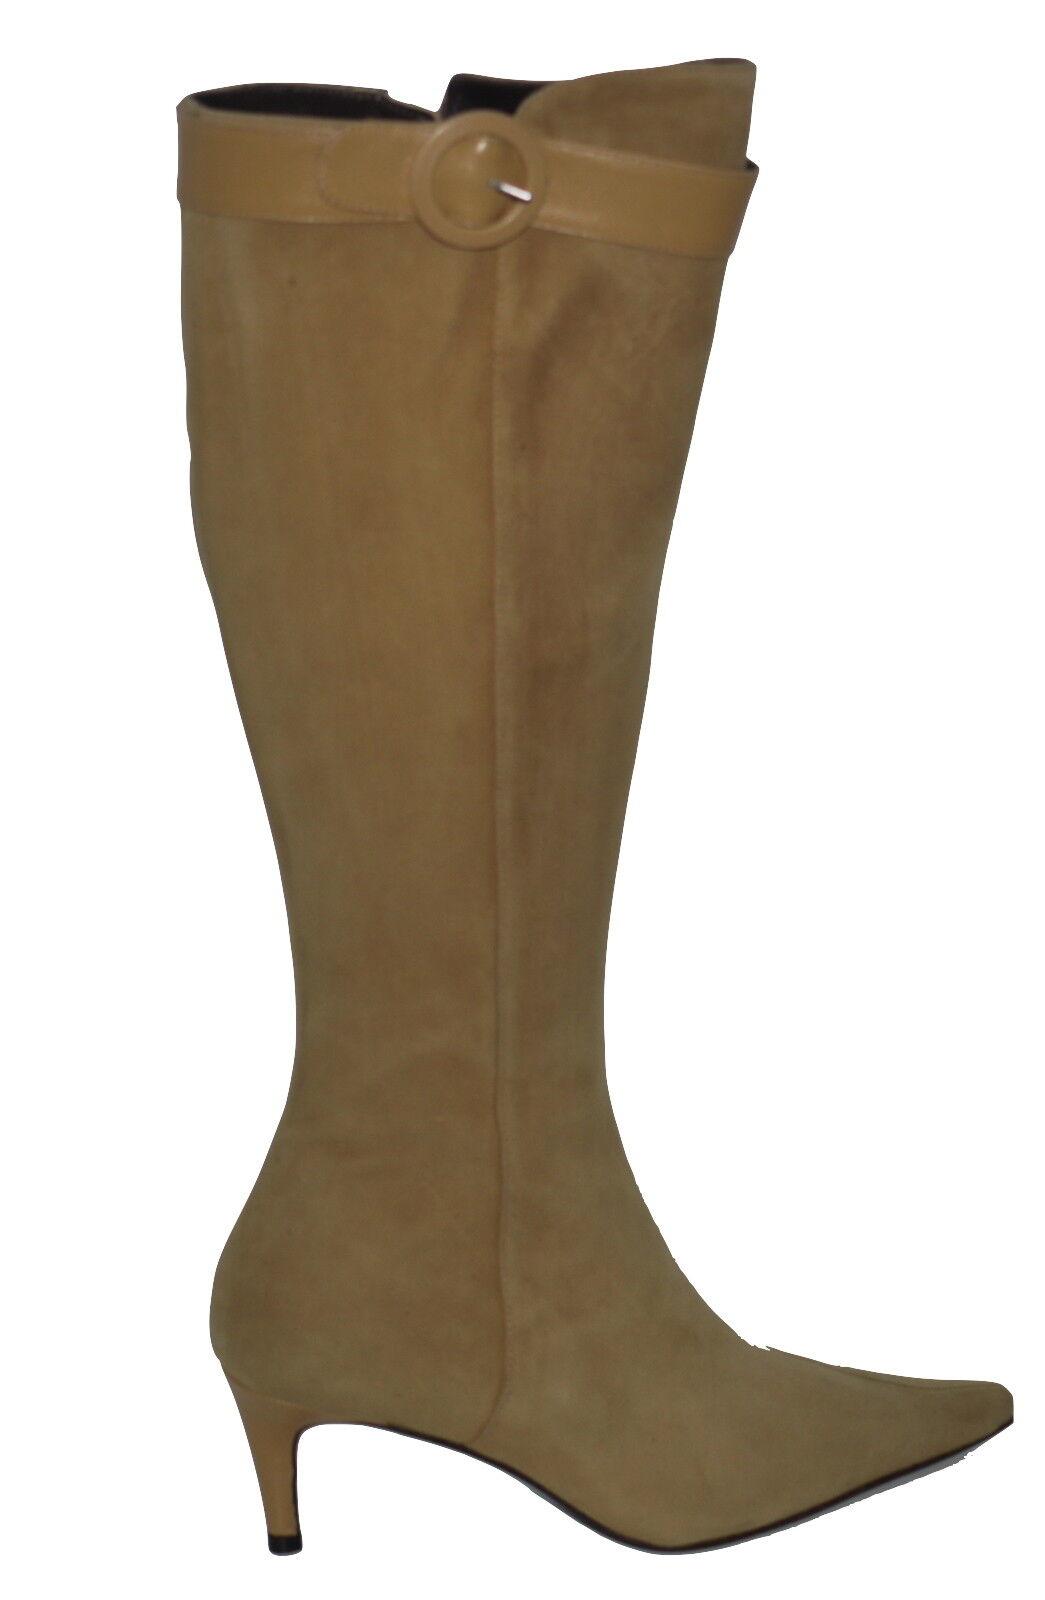 Martinez Valero Camel Suede Stiefel Größe 3.5 NIB SP